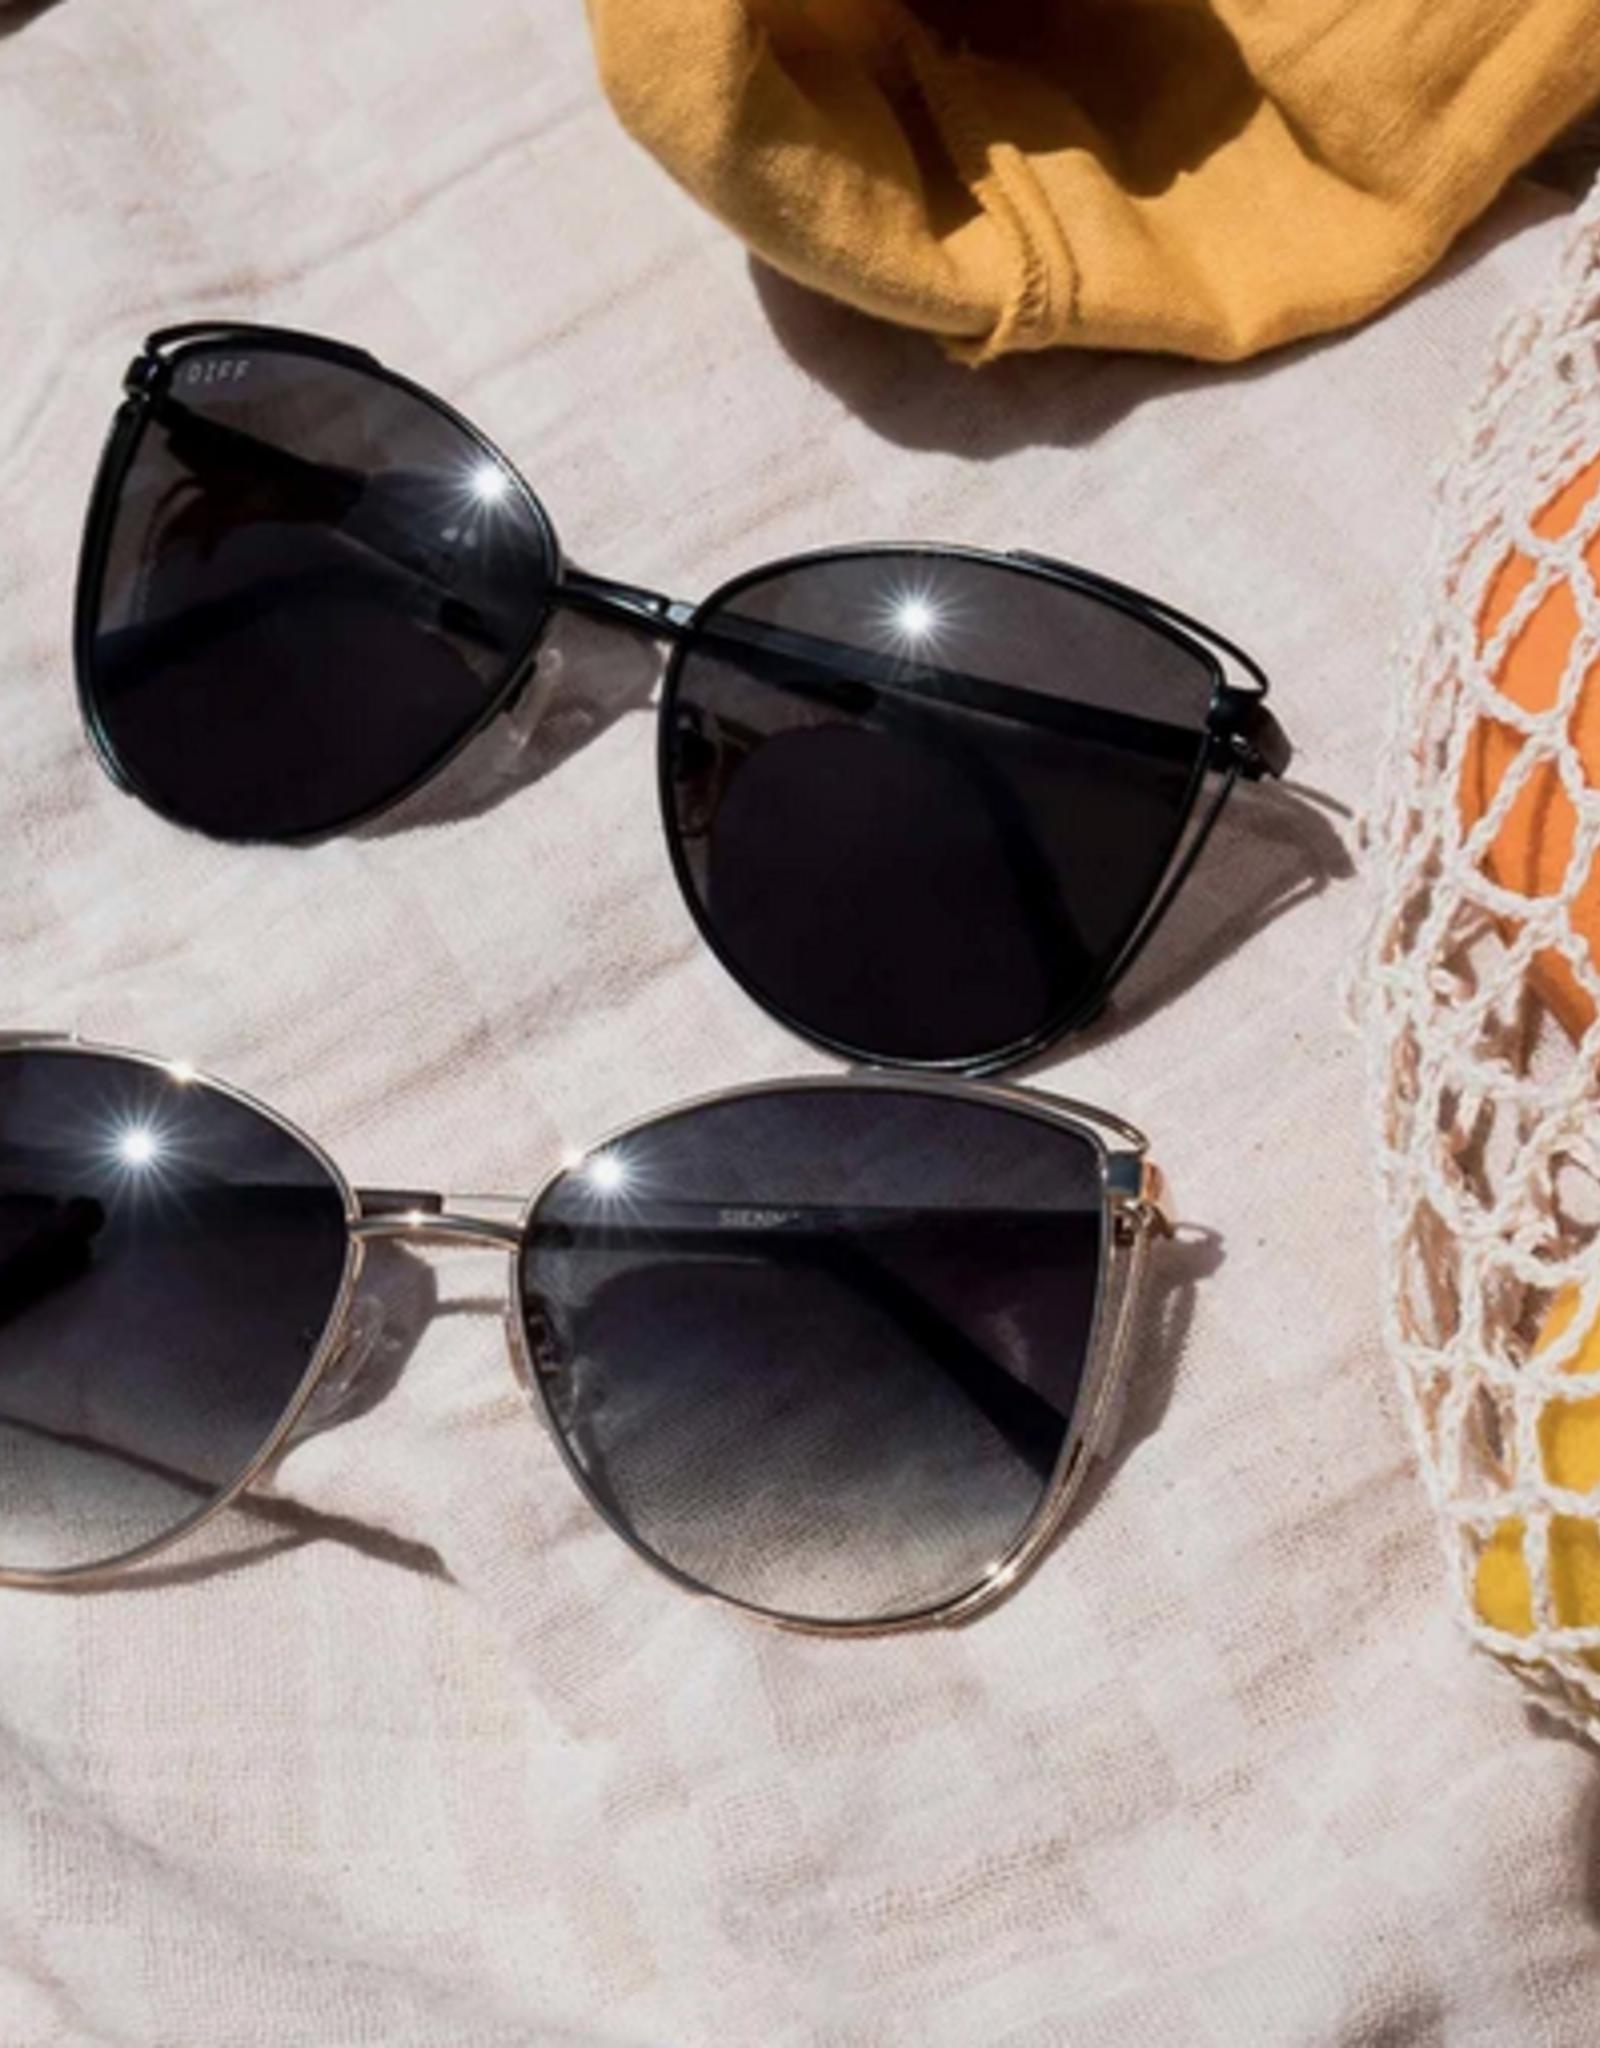 DIFF Sienna Black+Grey Lens Sunglasses